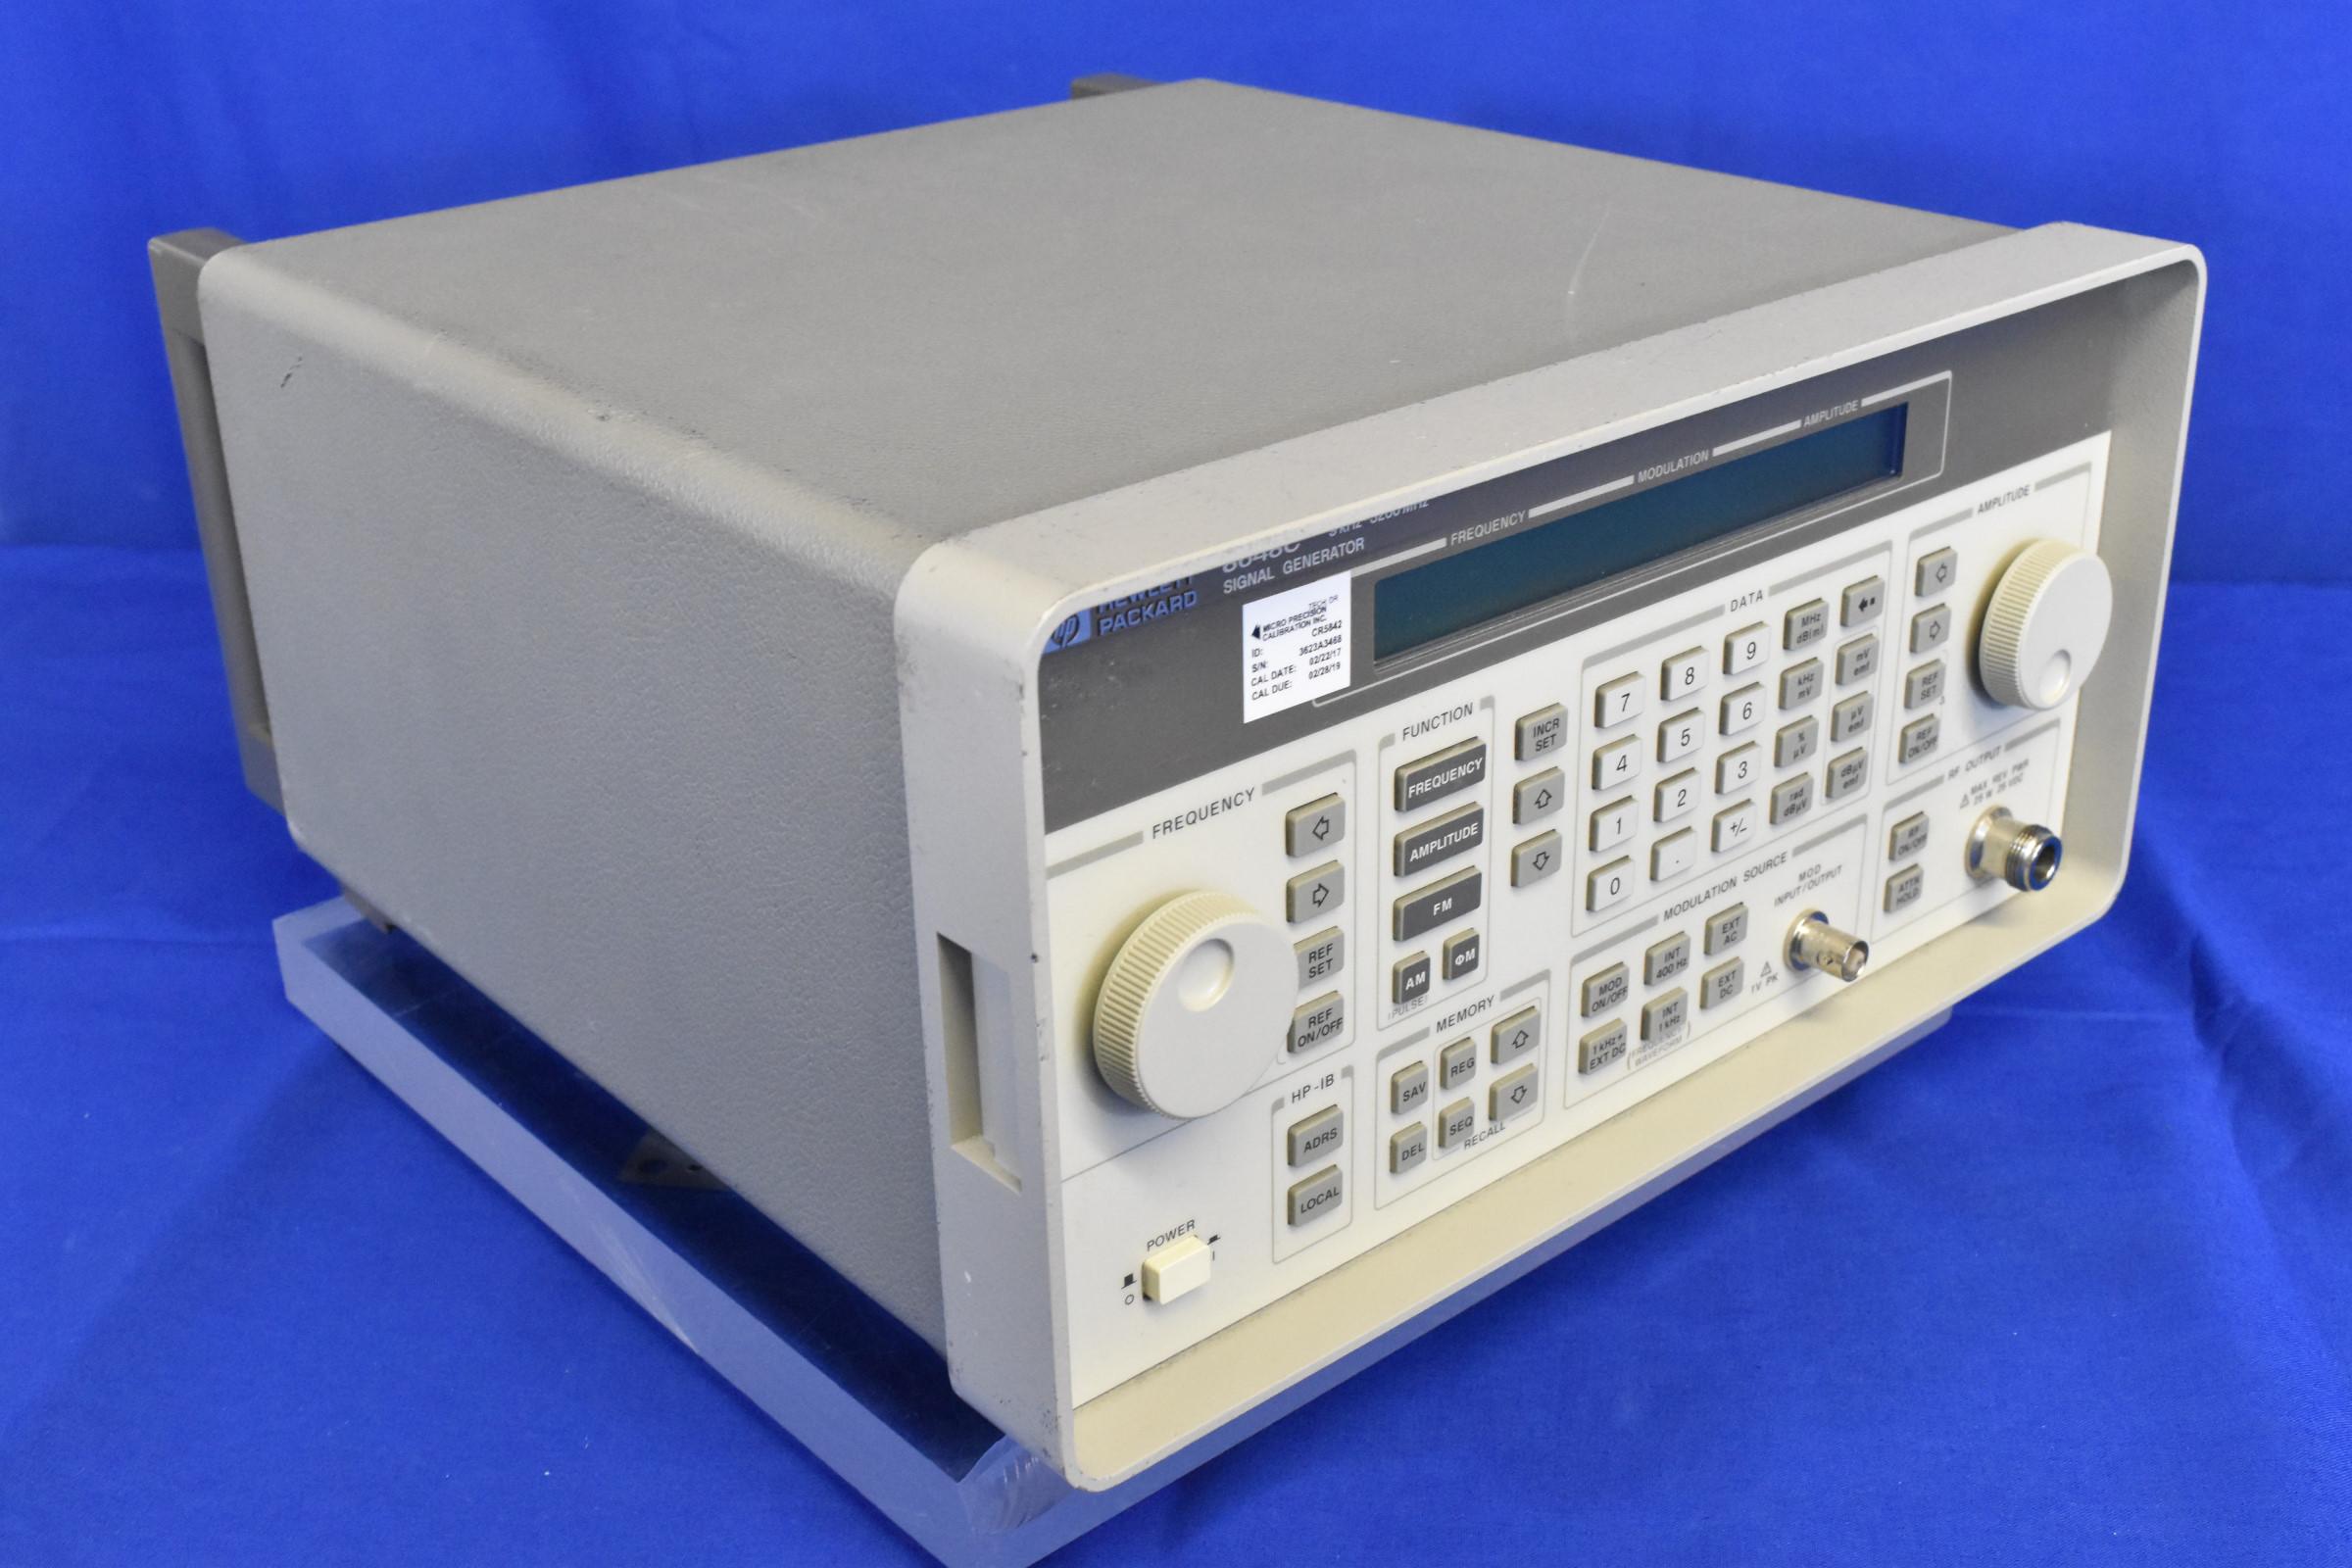 SN 534_003